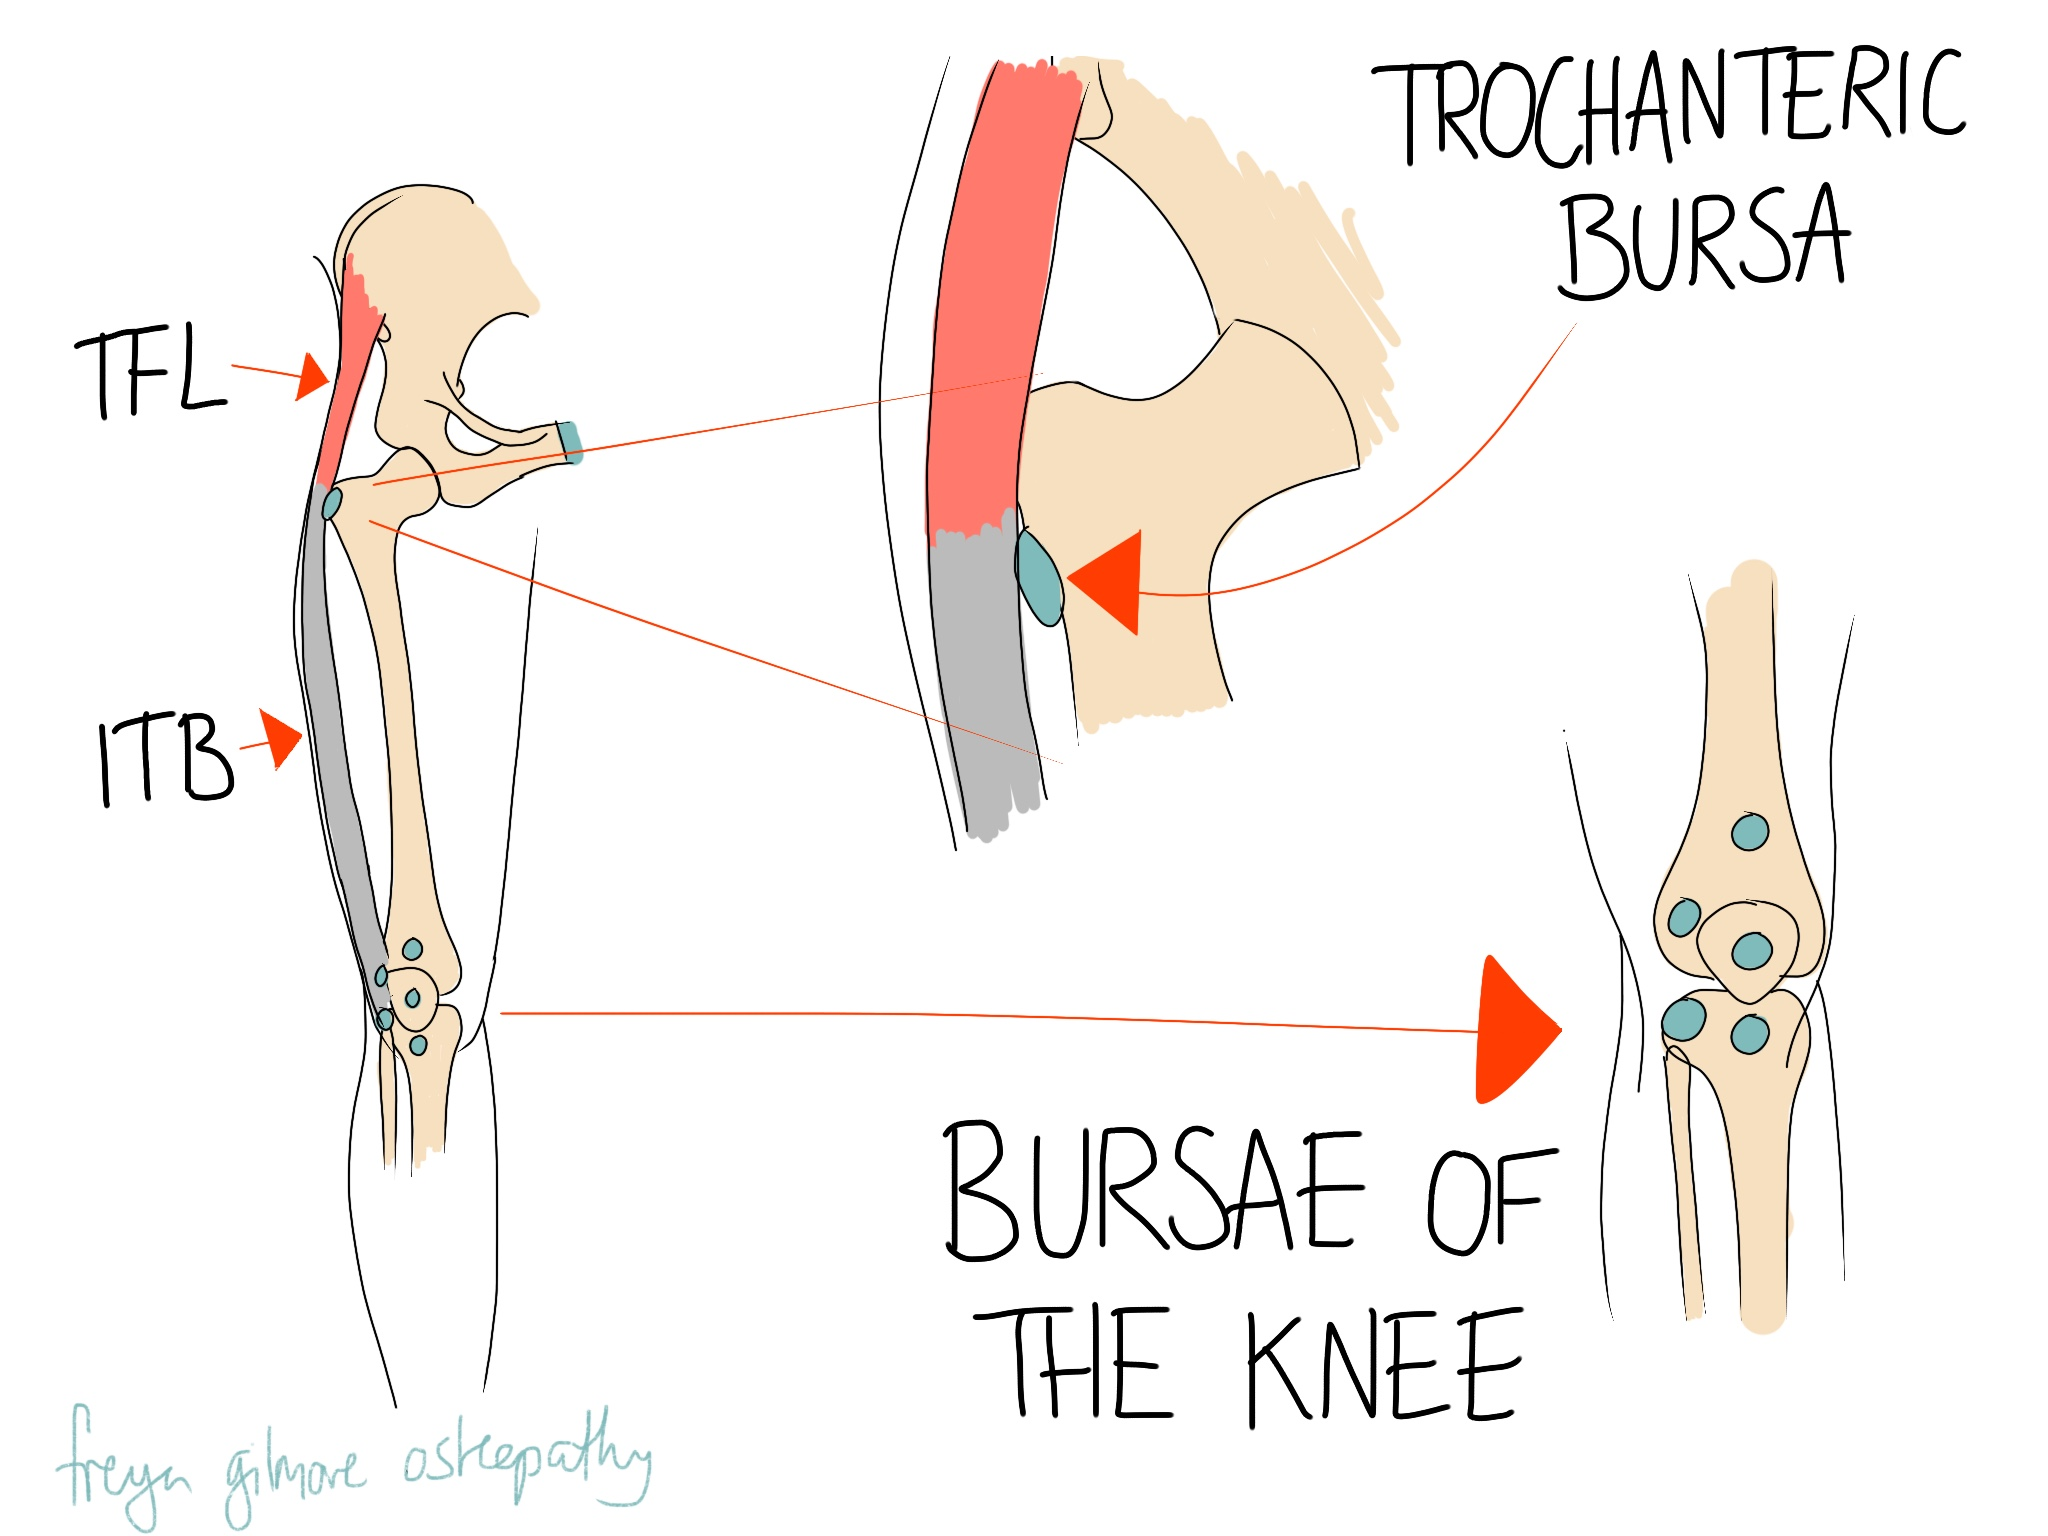 Bursae of the hip and knee